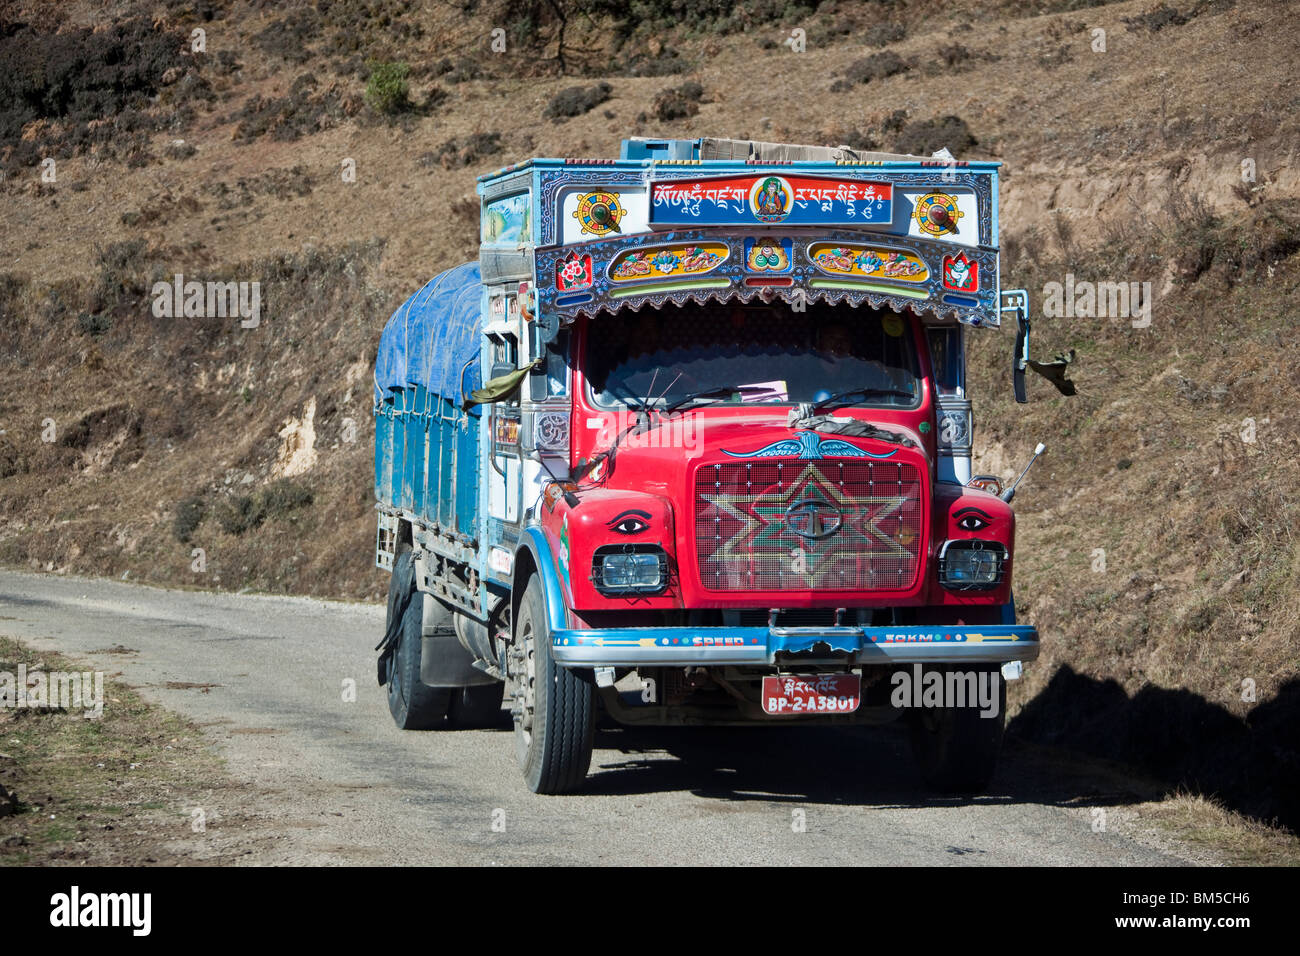 Decorated Tata truck hauling goods on the bhutanese national highway, Bumthang region, Bhutan - Stock Image